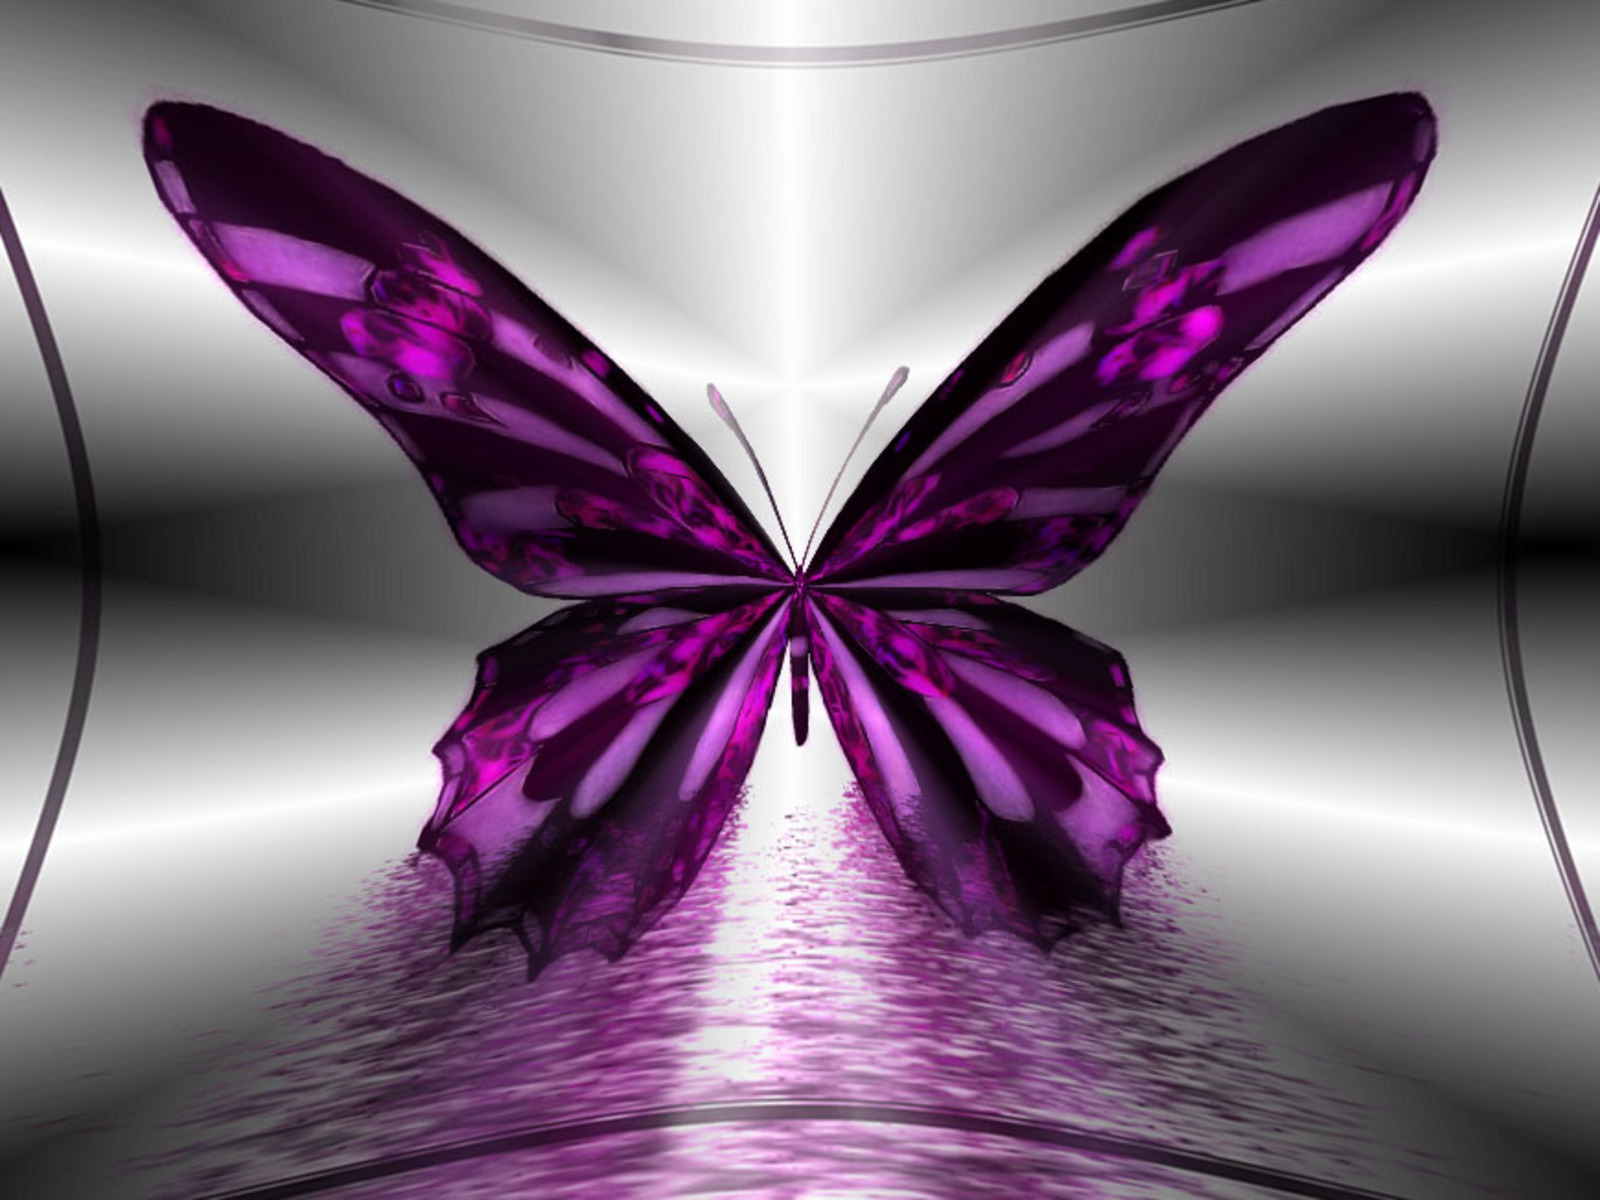 Wallpapers   HD Desktop Wallpapers Online Butterfly Wallpapers 1600x1200